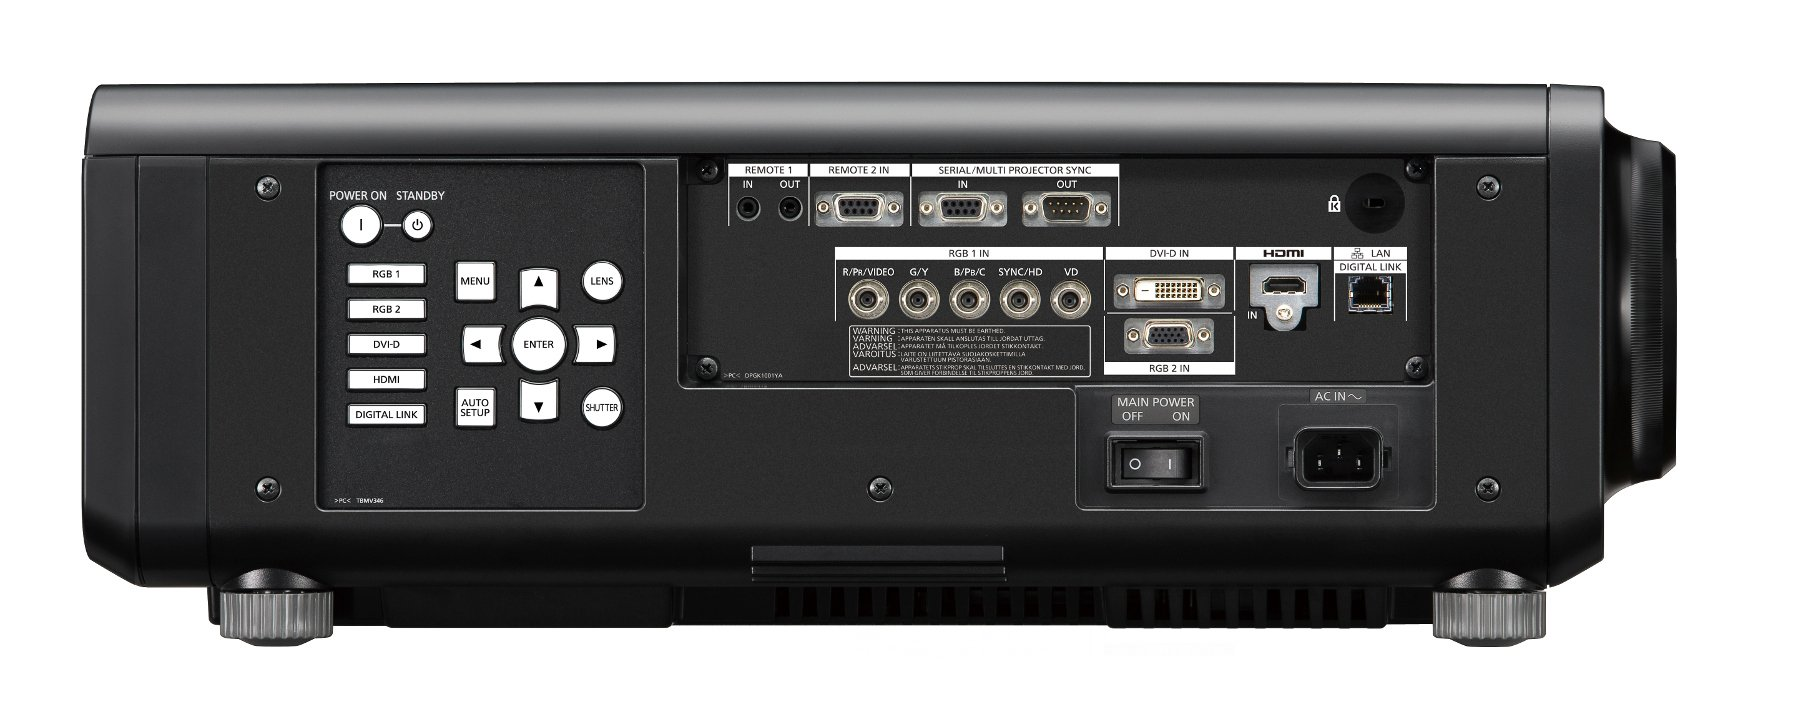 Panasonic PT-RW930LBU 10,000 Lumens WXGA DLP Laser Projector Body Only in Black PTRW930LBU